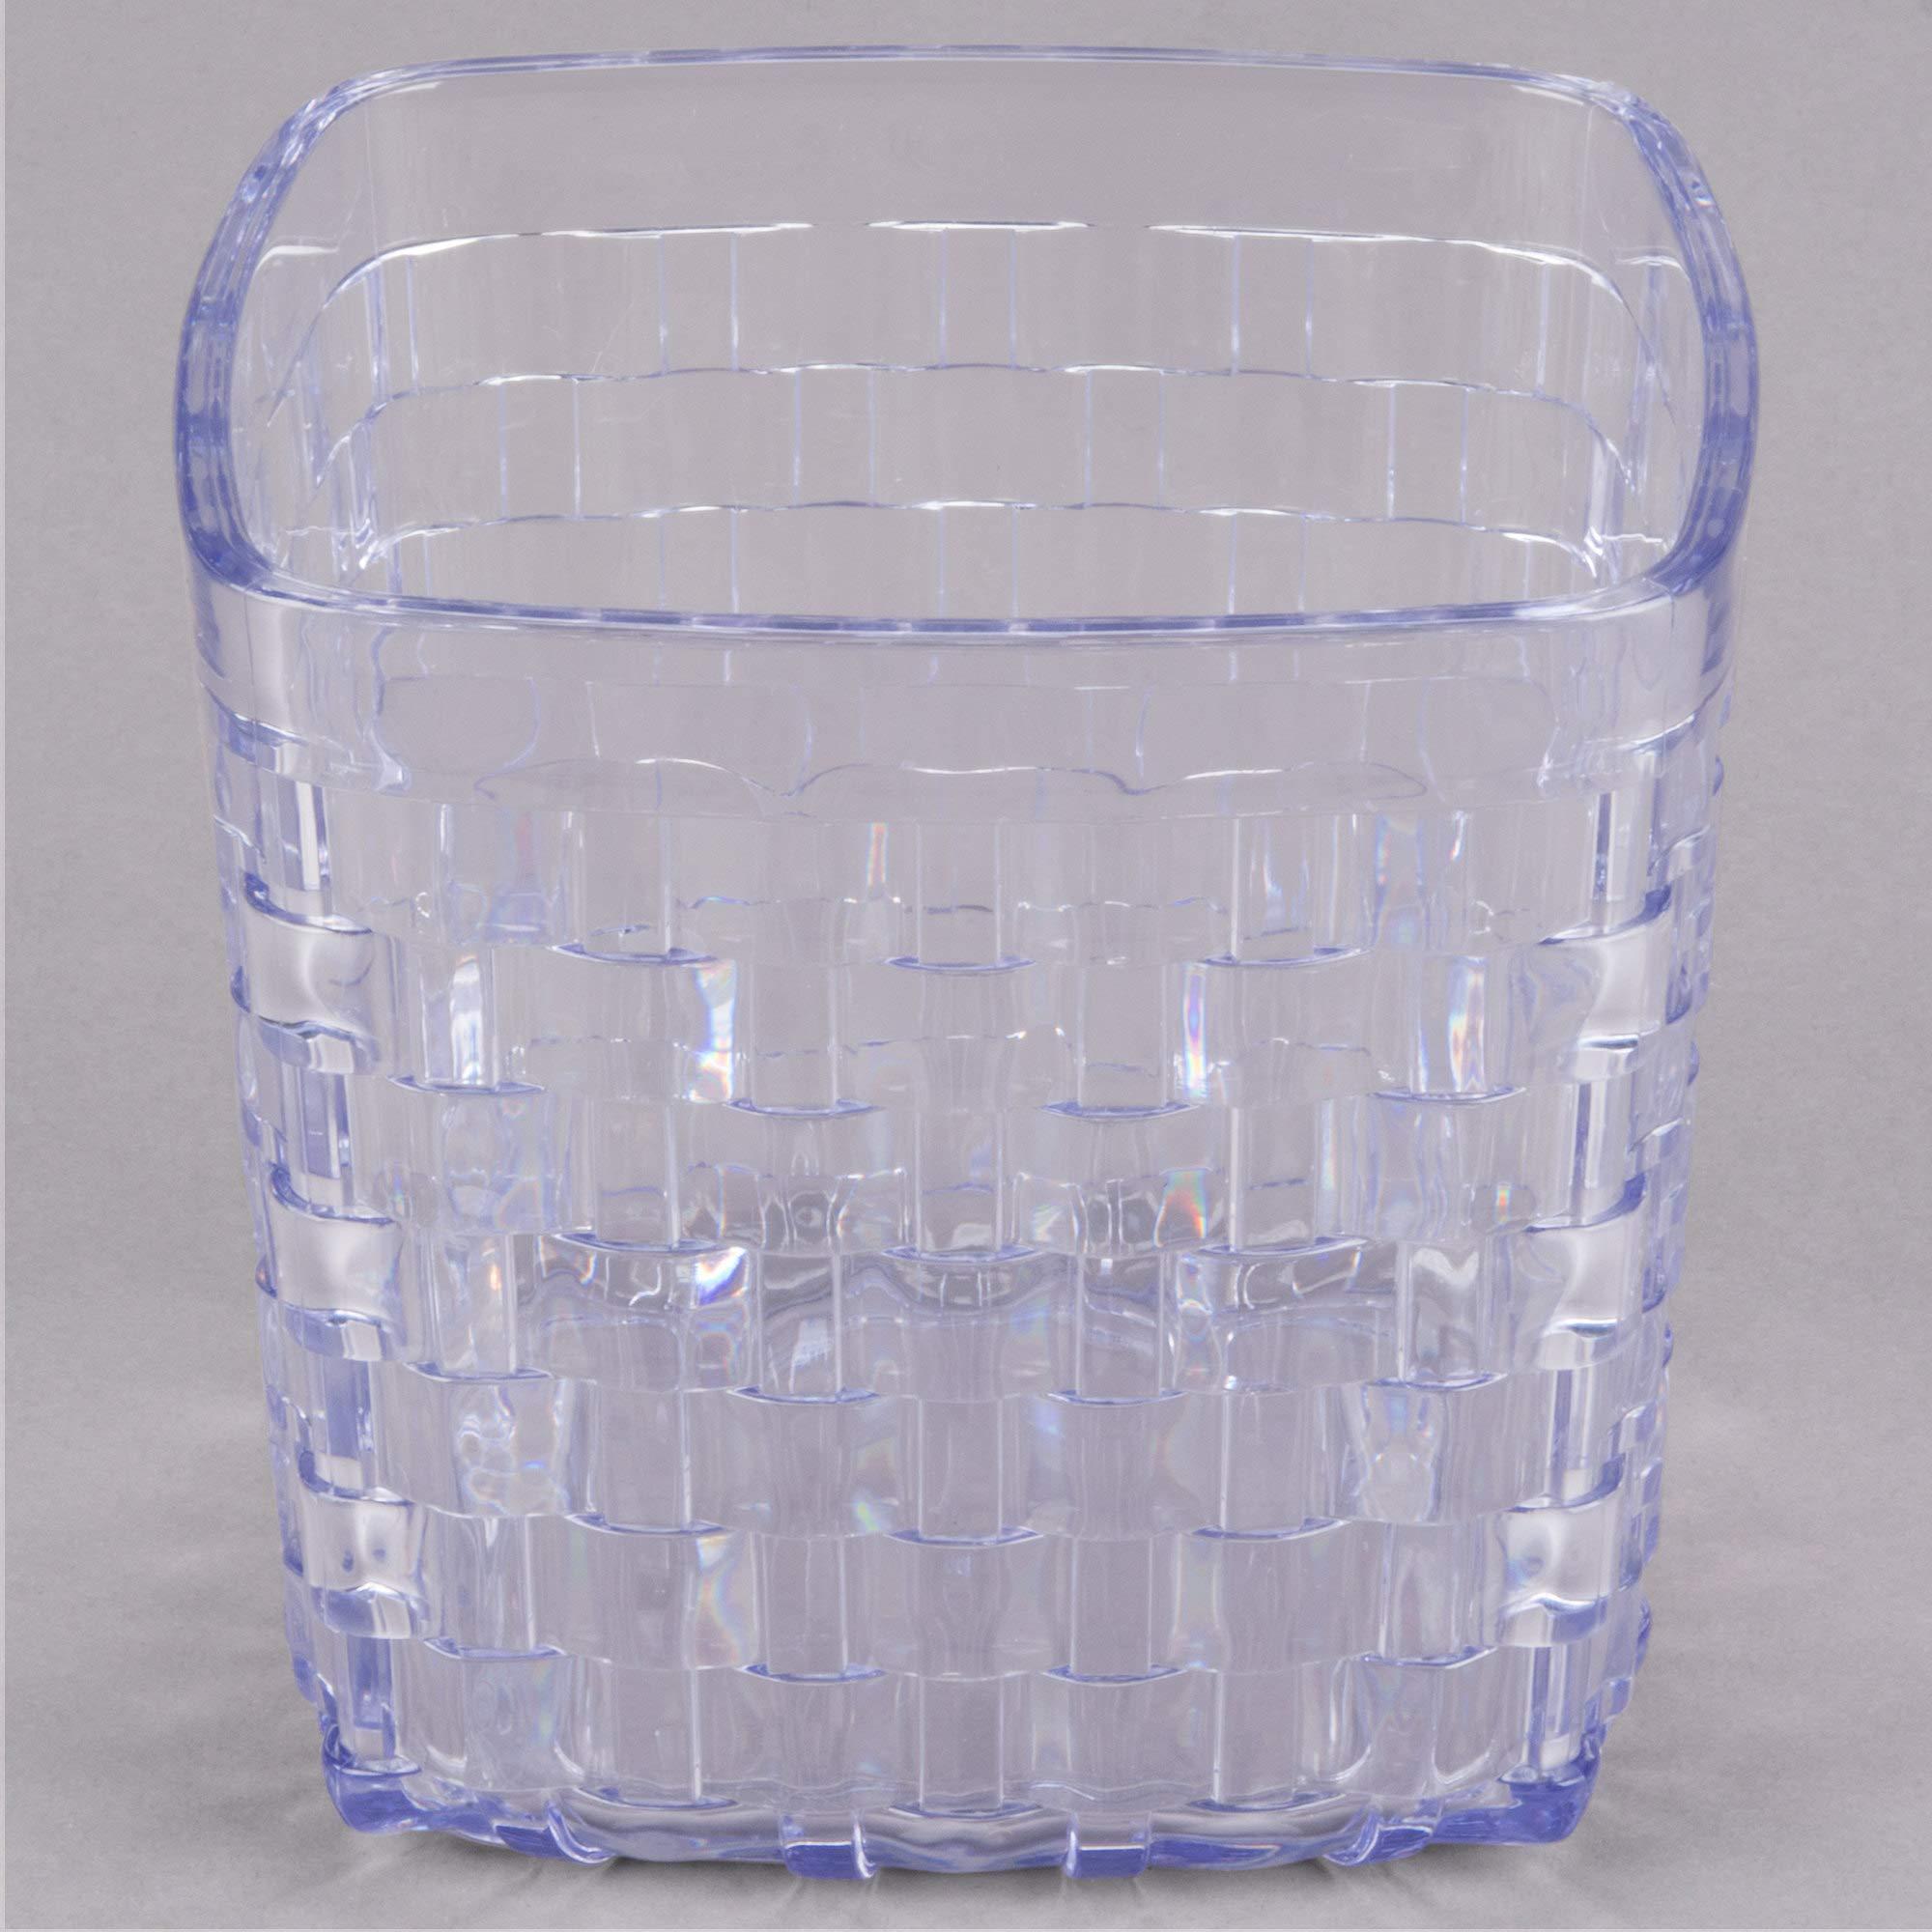 TableTop King 35607 3 Qt. SAN Plastic Serving Basket 6 1/2'' x 6'' - 6/Case